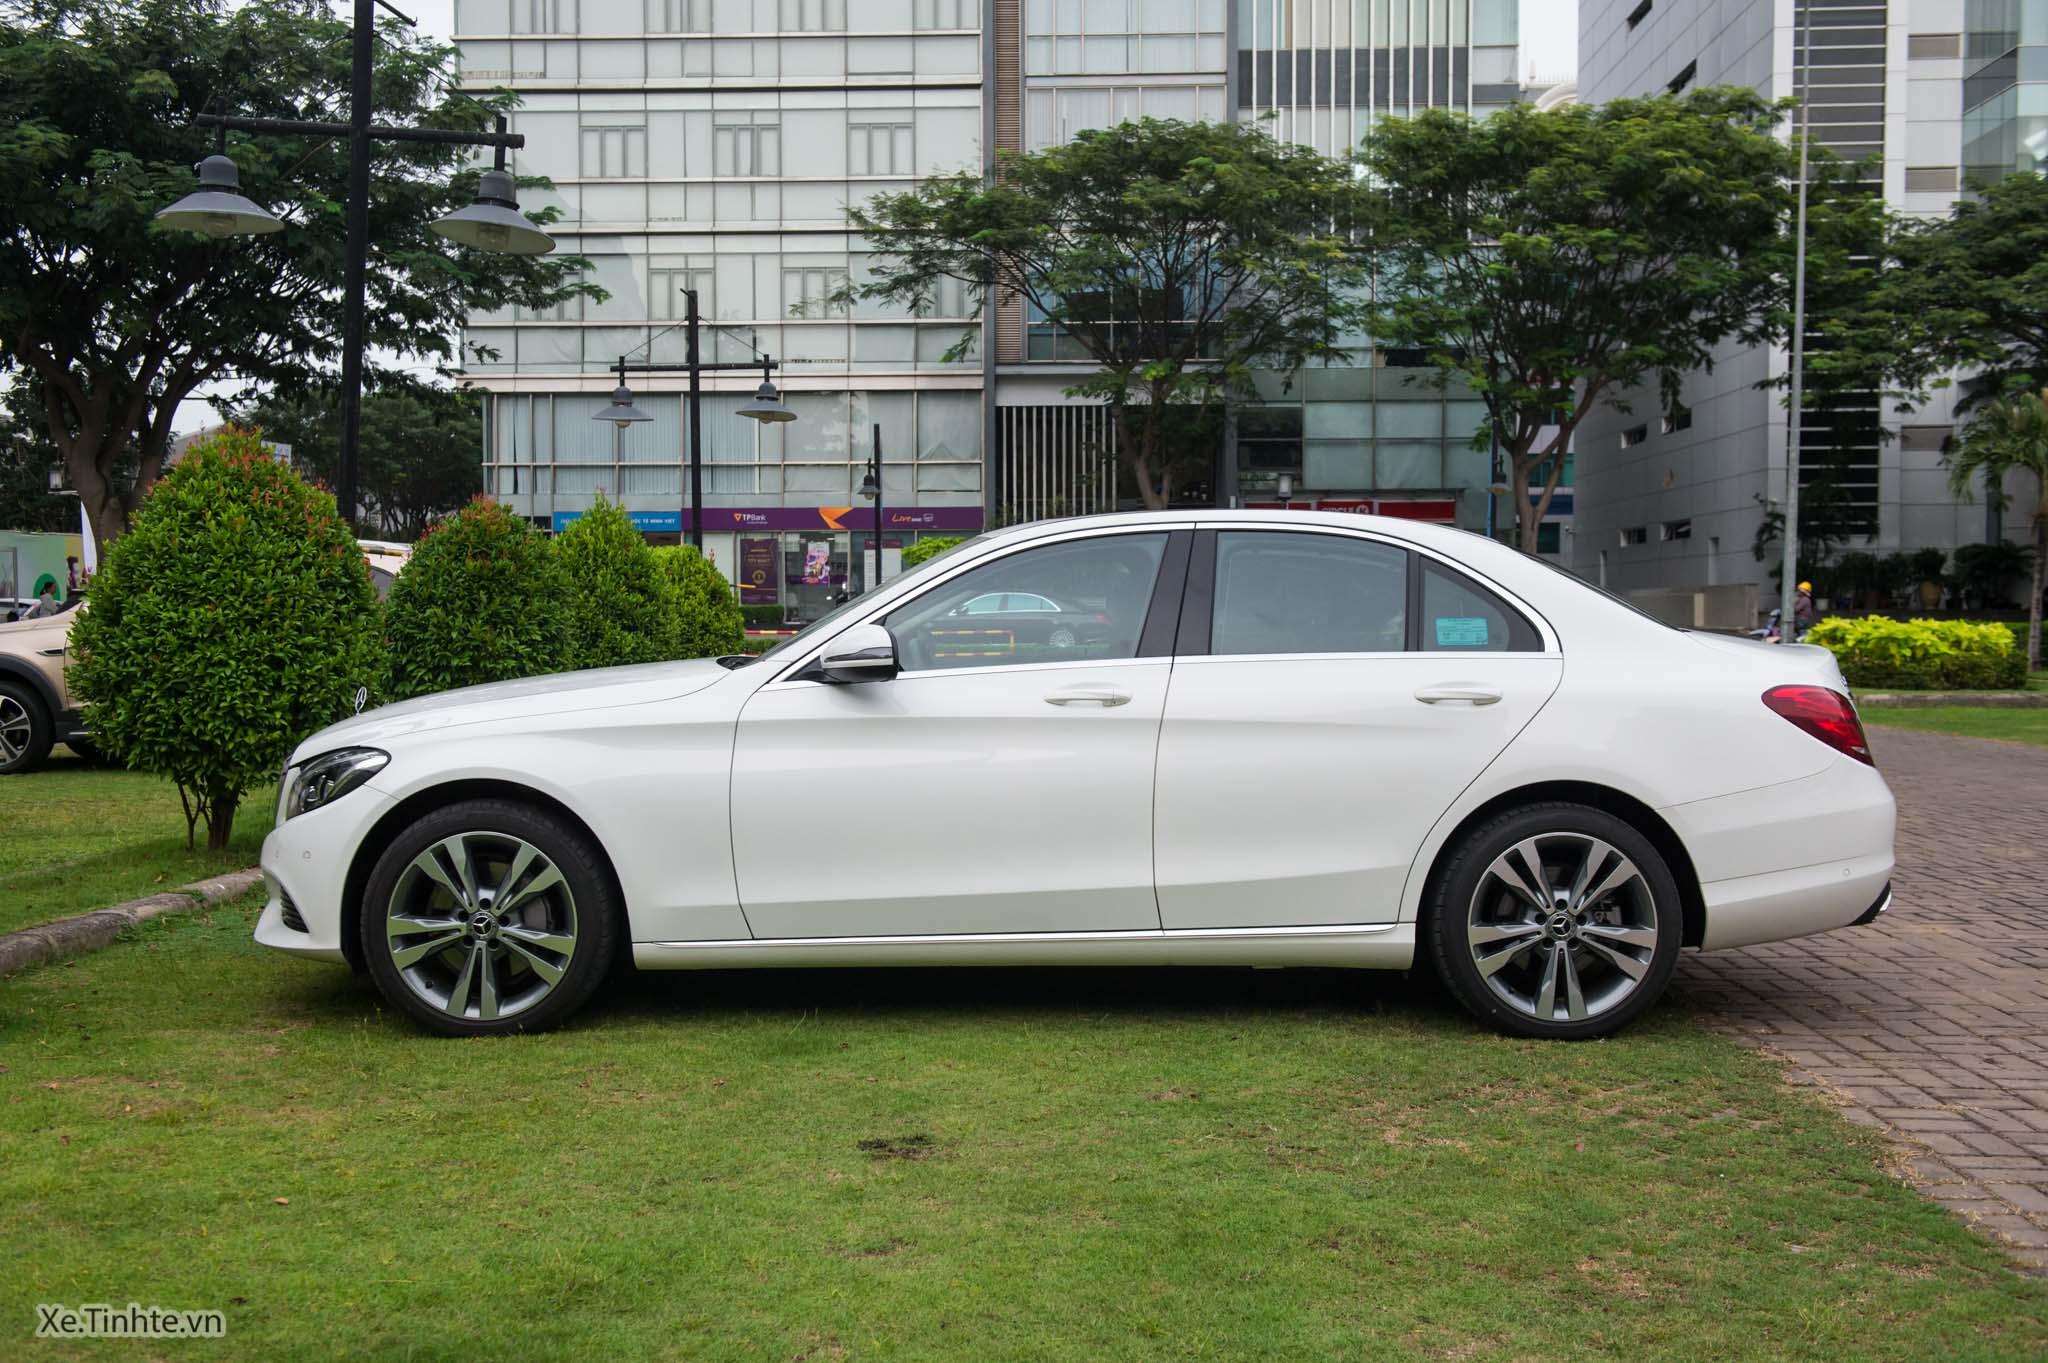 Mercedes_C250 Exclusive_Xe.tinhte.vn-7277.jpg